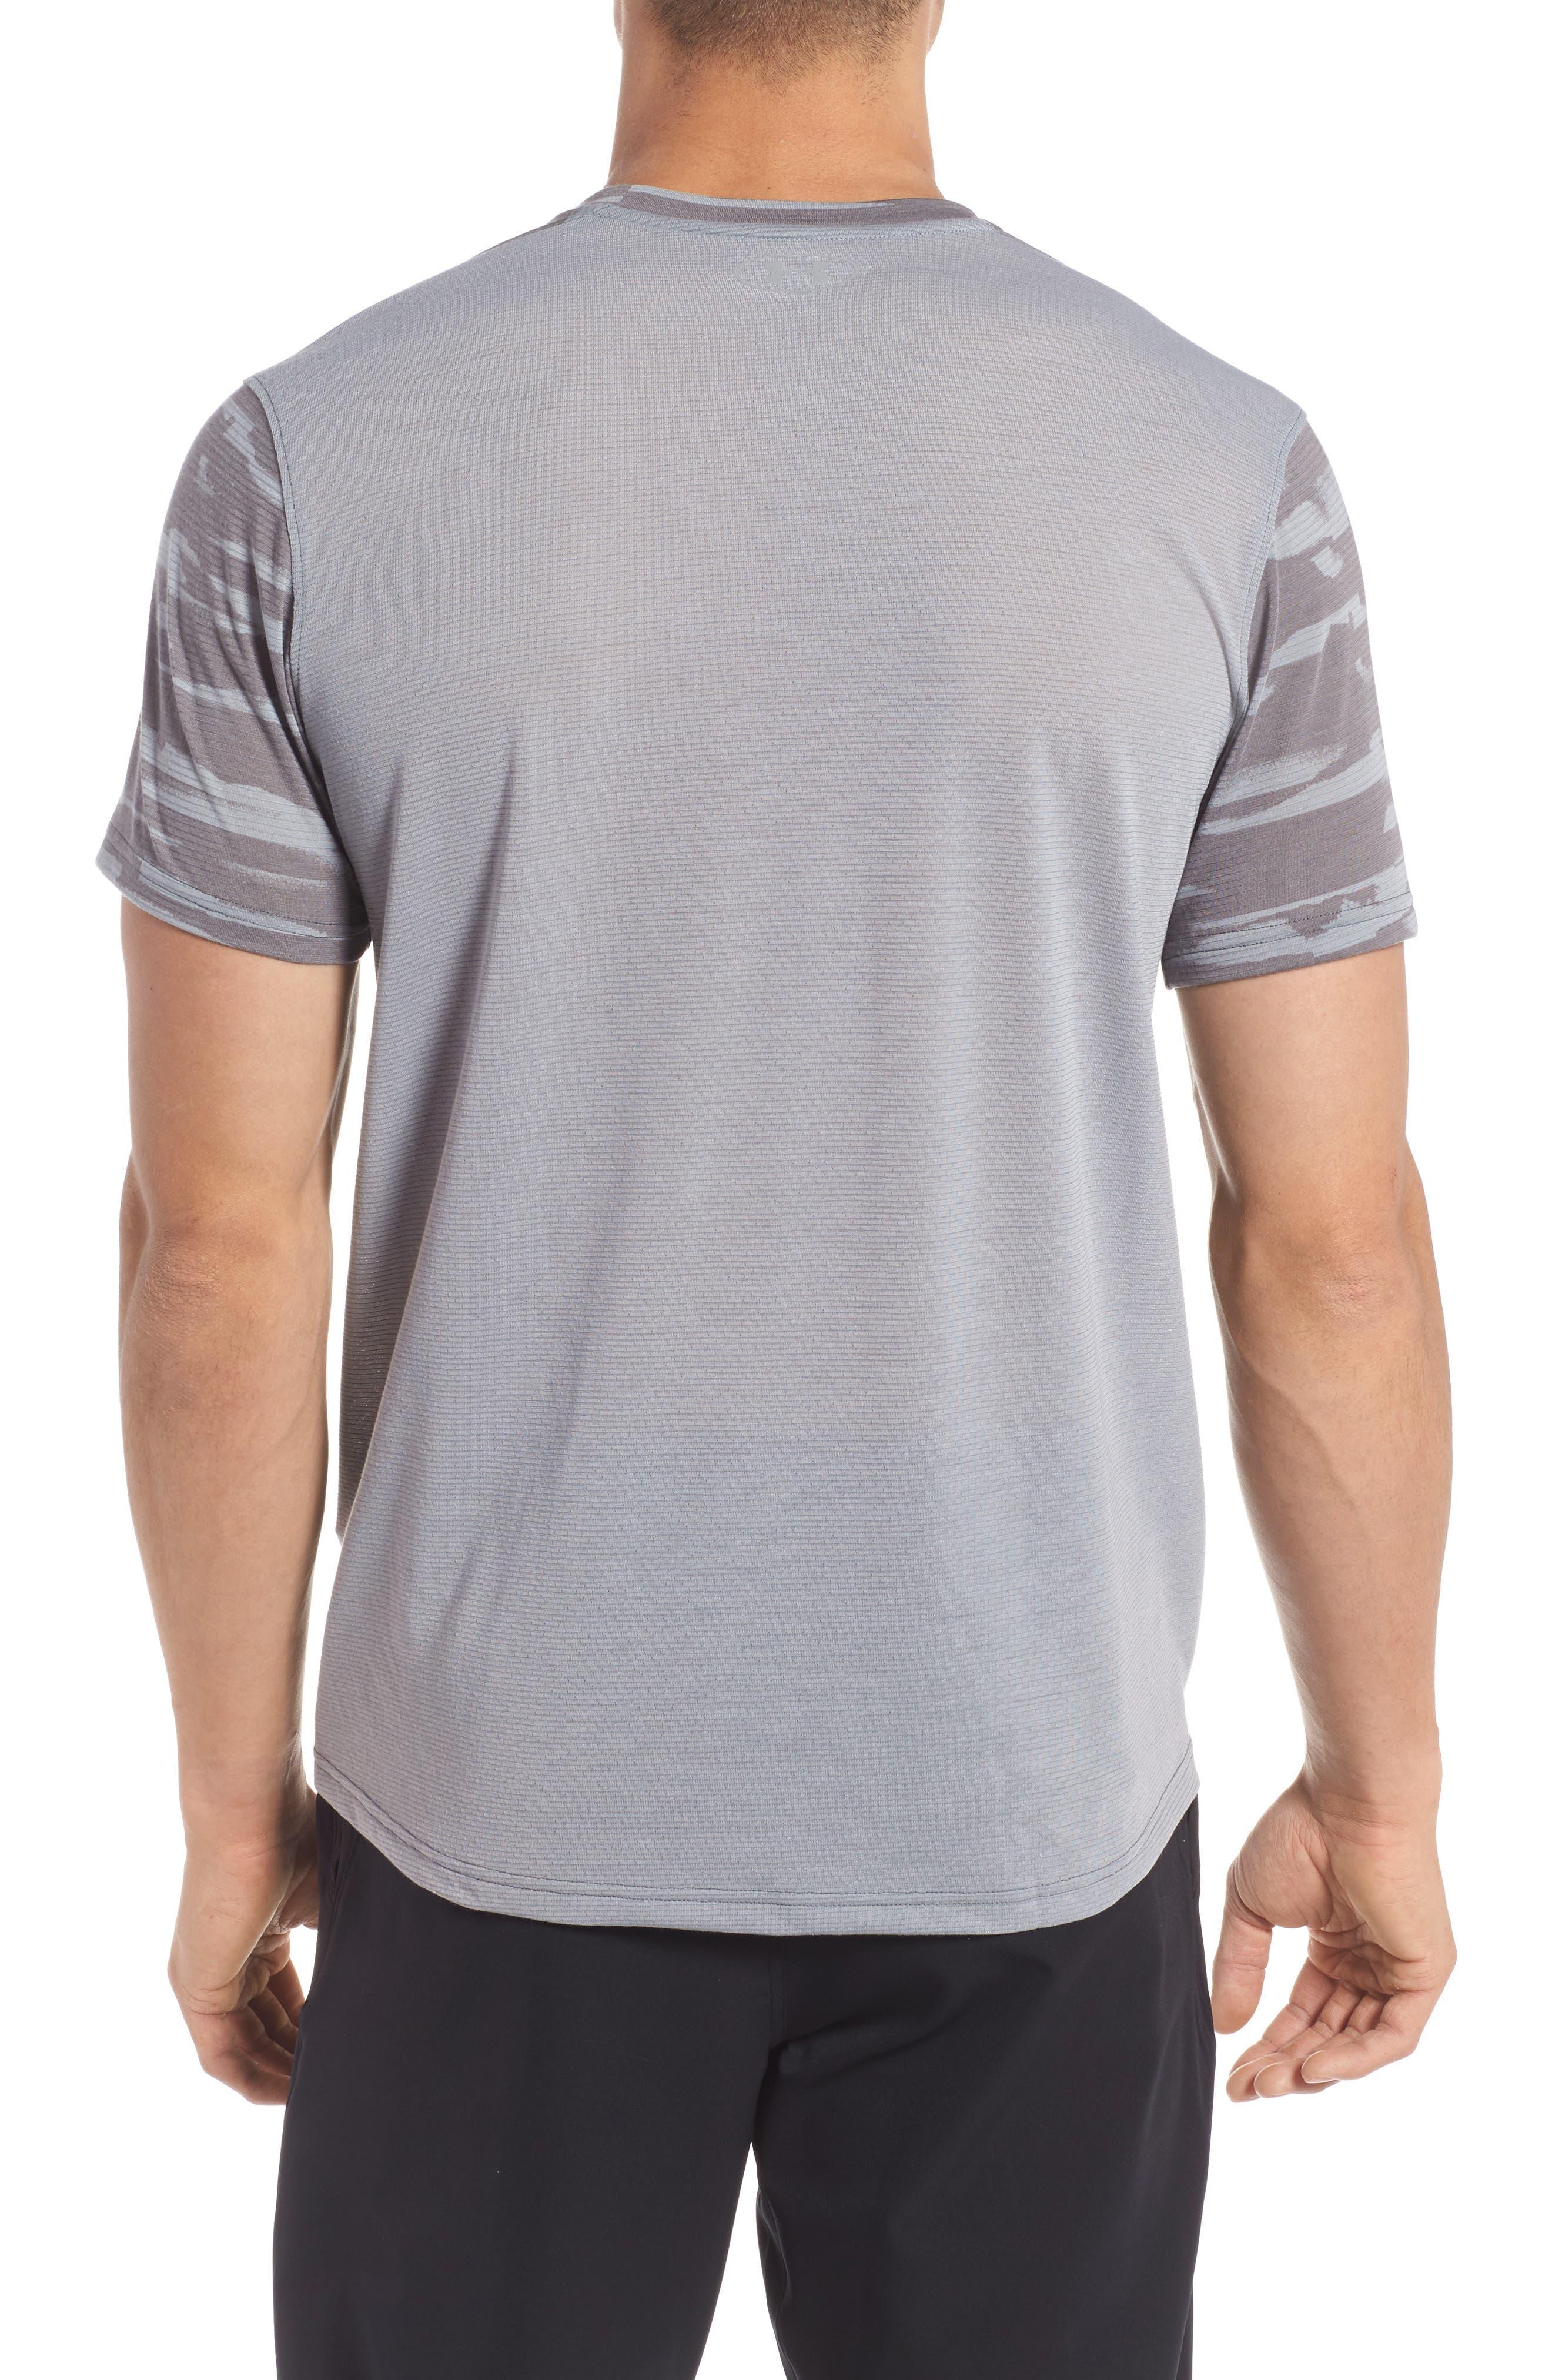 Threadborne Mesh Running T-Shirt,                             Alternate thumbnail 2, color,                             Grey / Black / Reflective